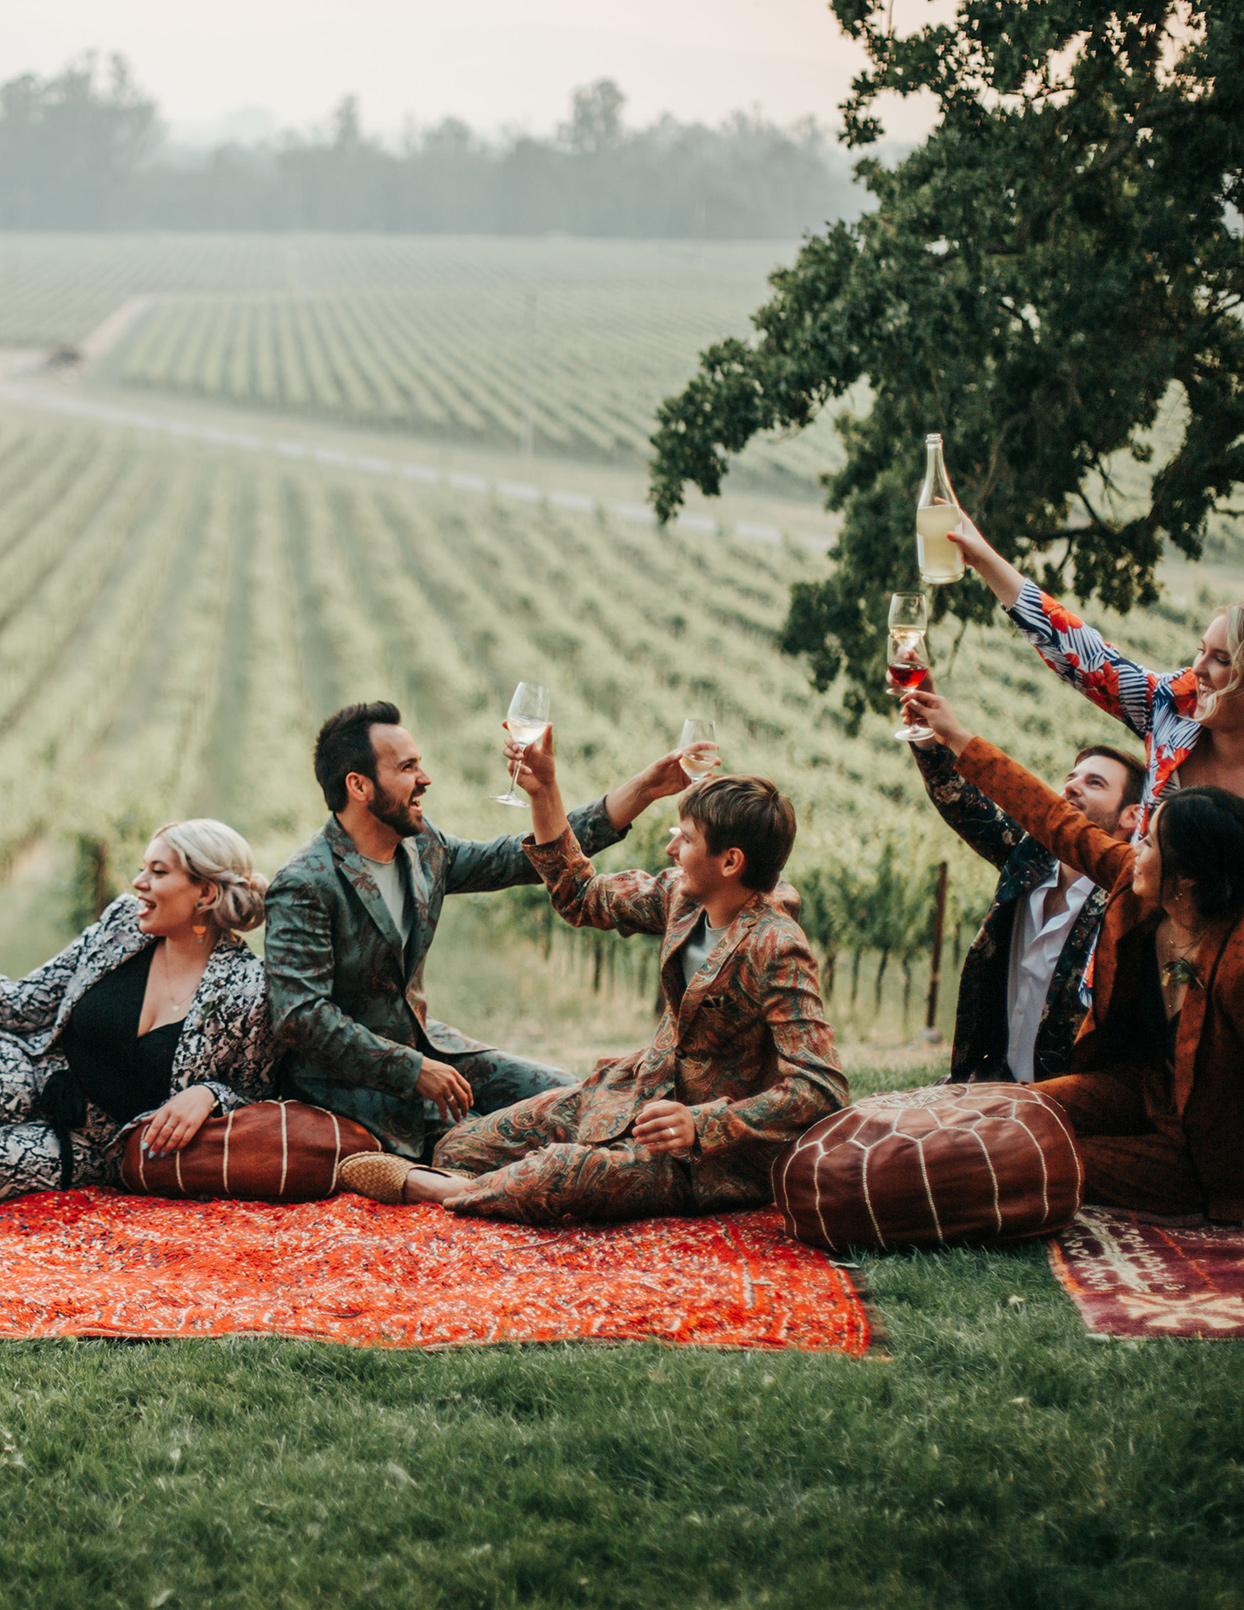 austin alex wedding couple toasting on Moroccan rugs